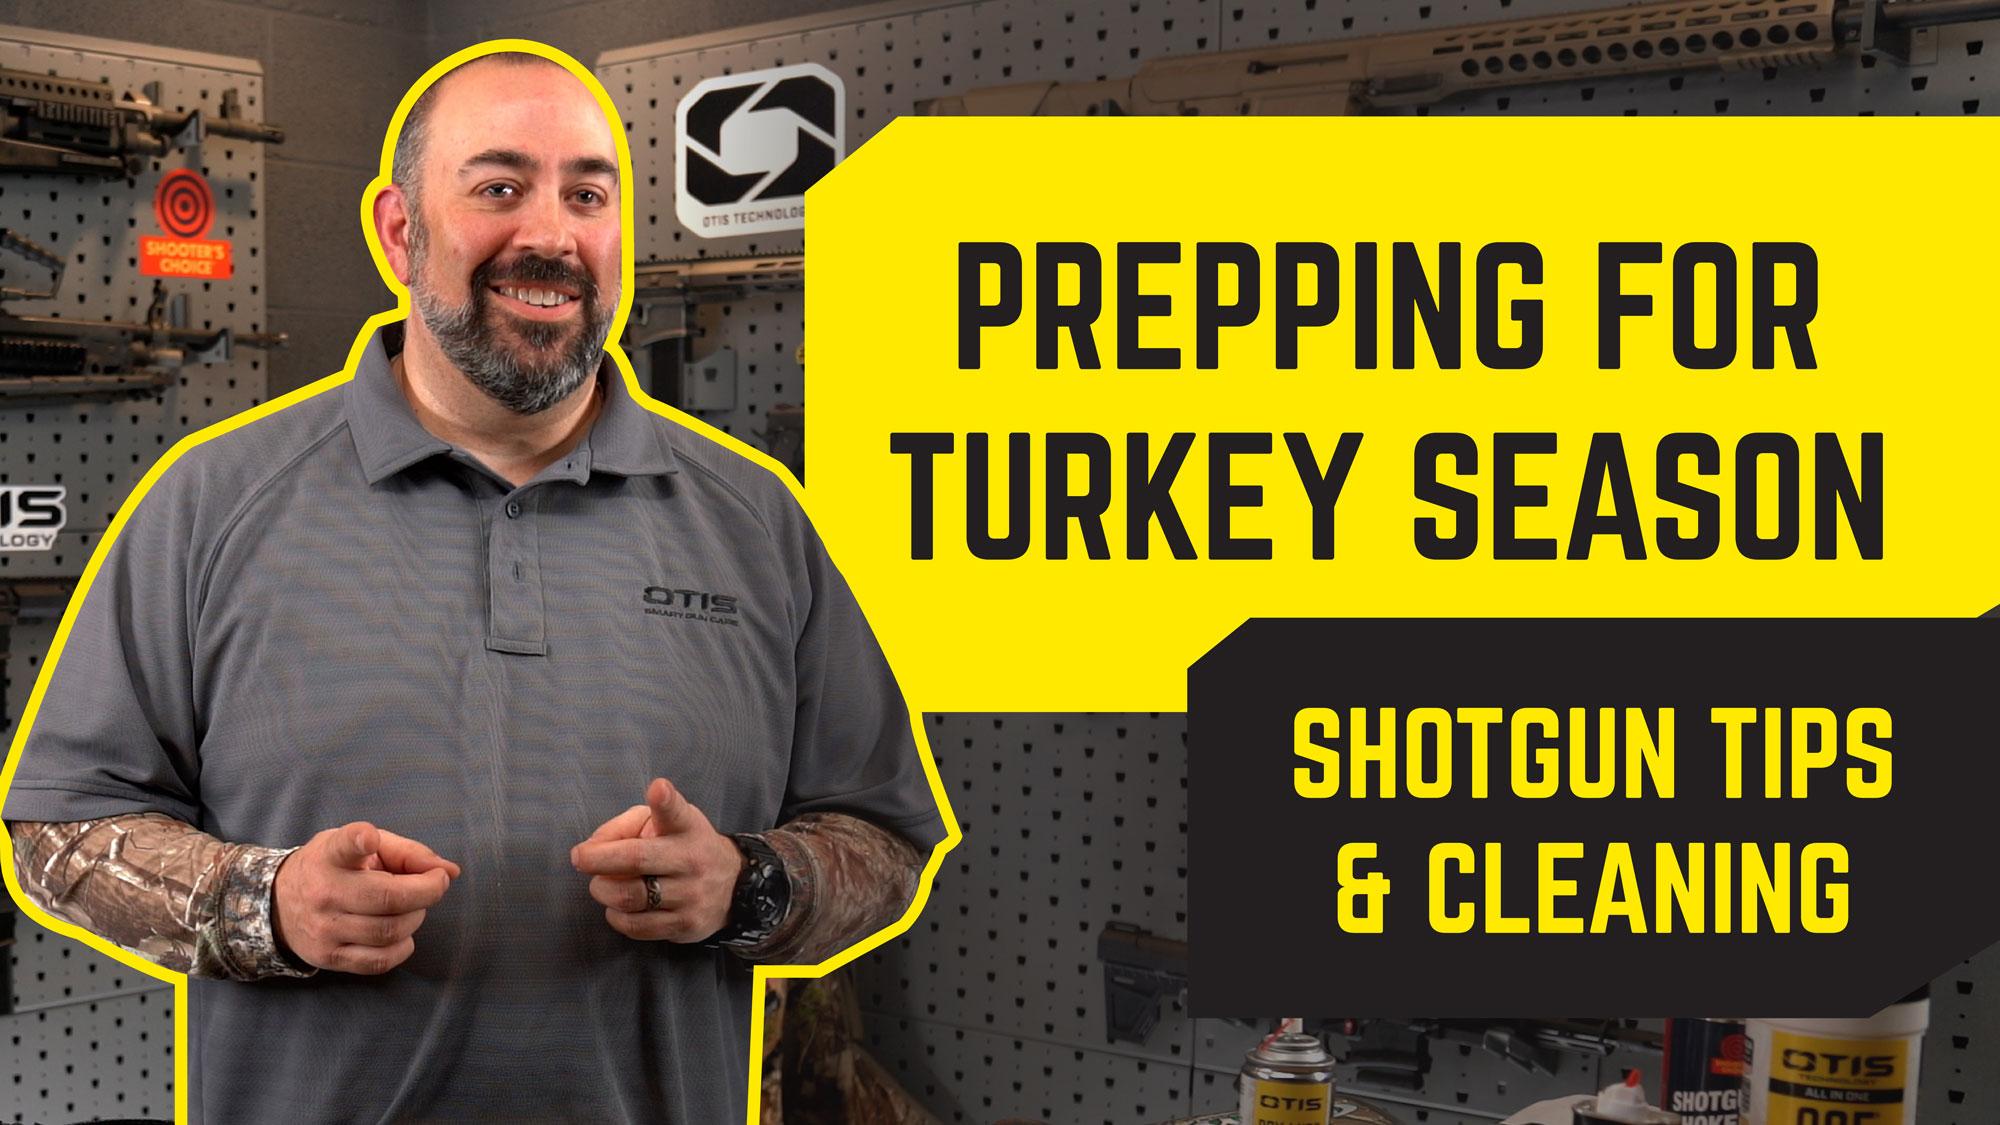 Prepping for Turkey Season | Hunting Tips & Shotgun Cleaning